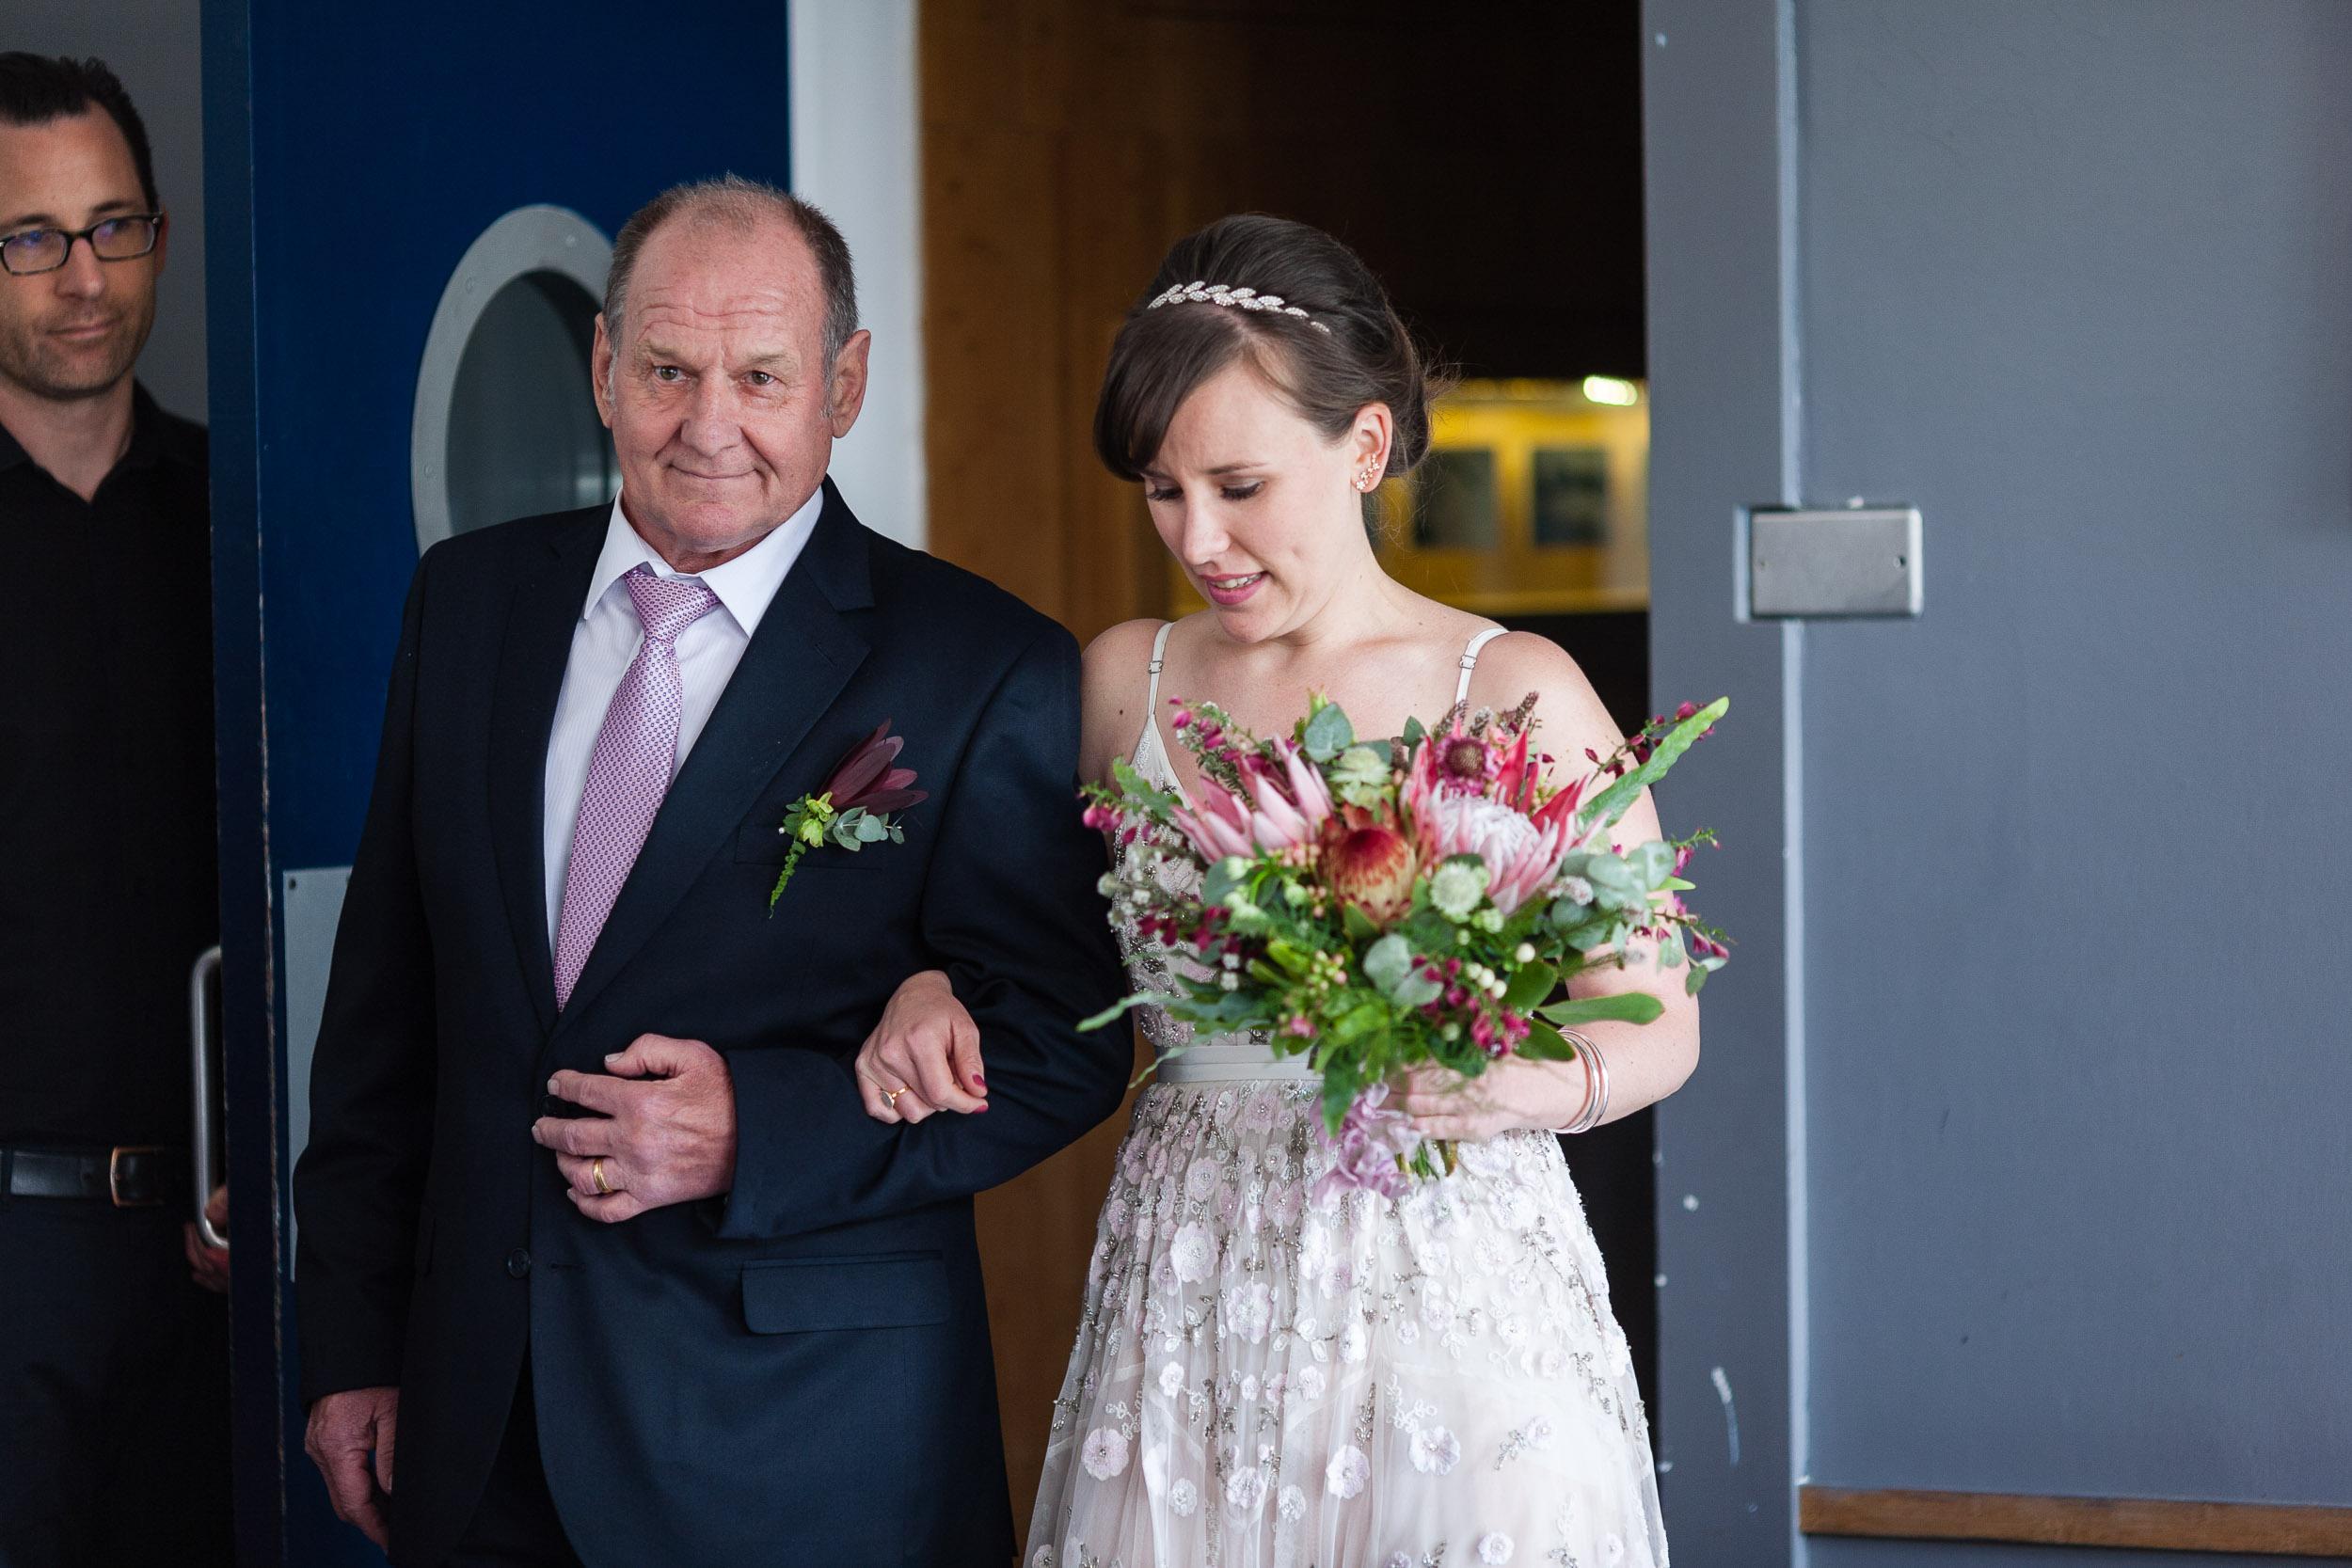 brockwell-lido-brixton-herne-hill-wedding-120.jpg